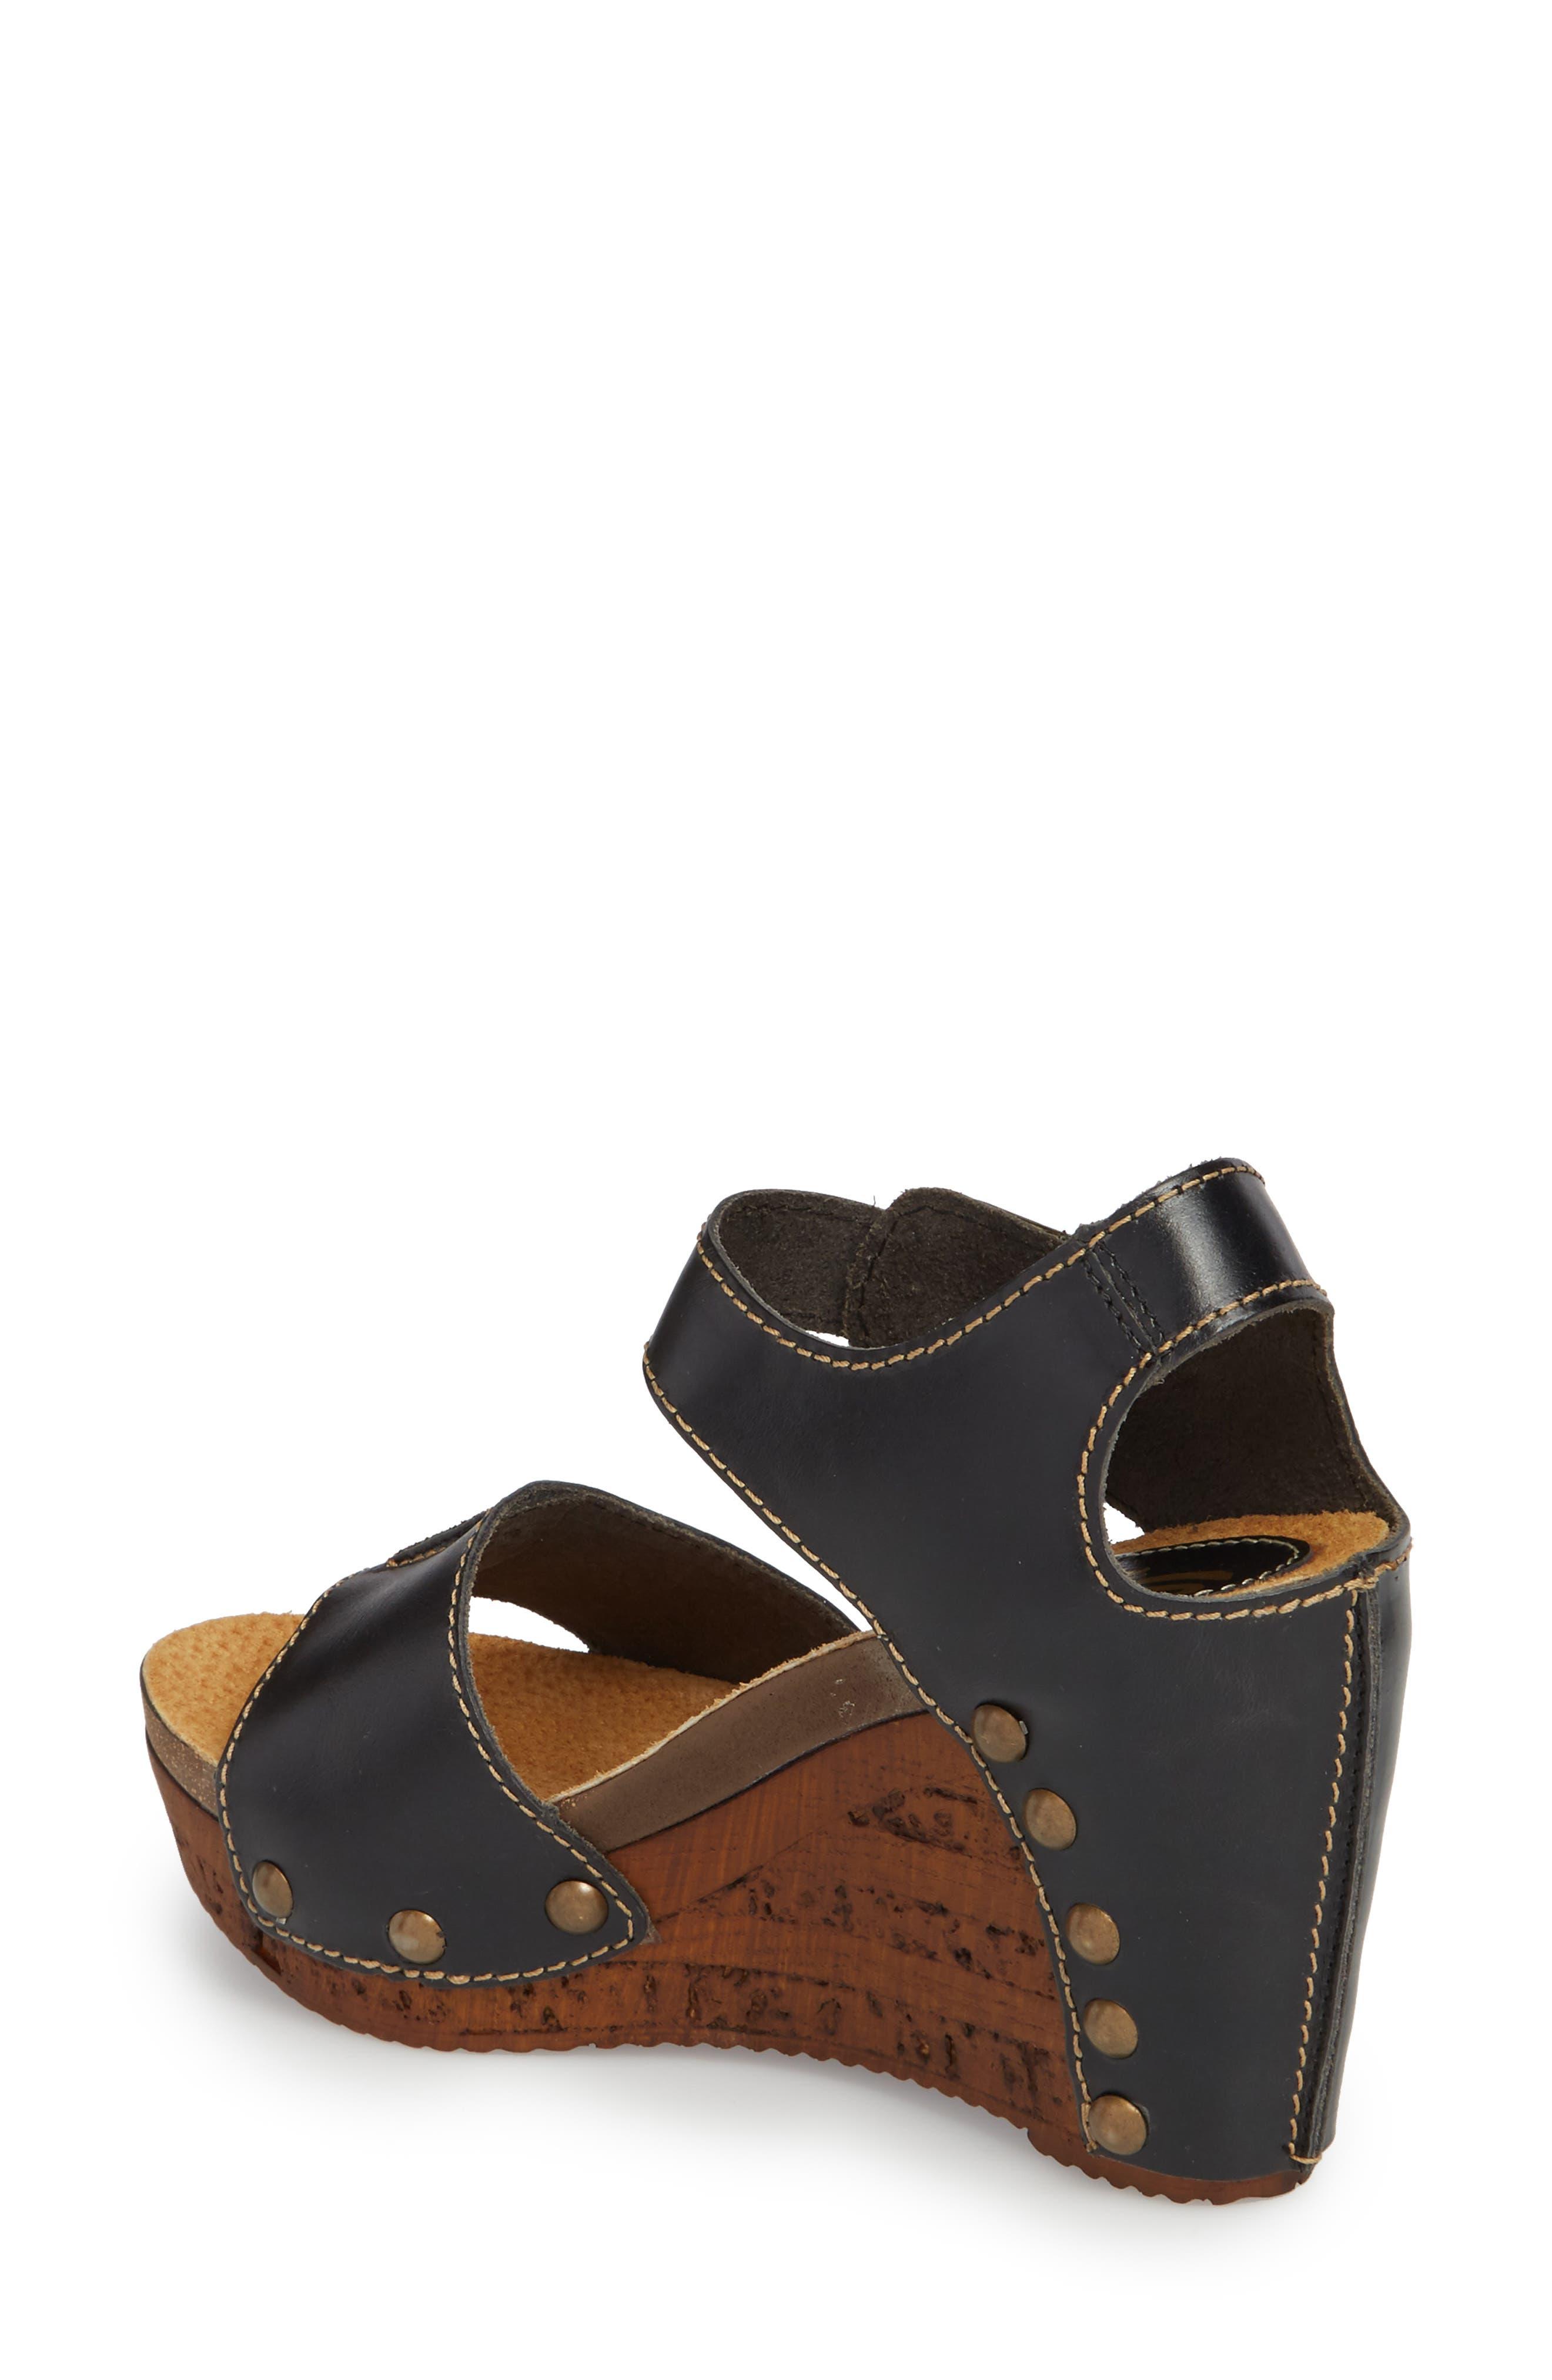 Brella Studded Platform Wedge Sandal,                             Alternate thumbnail 2, color,                             BLACK